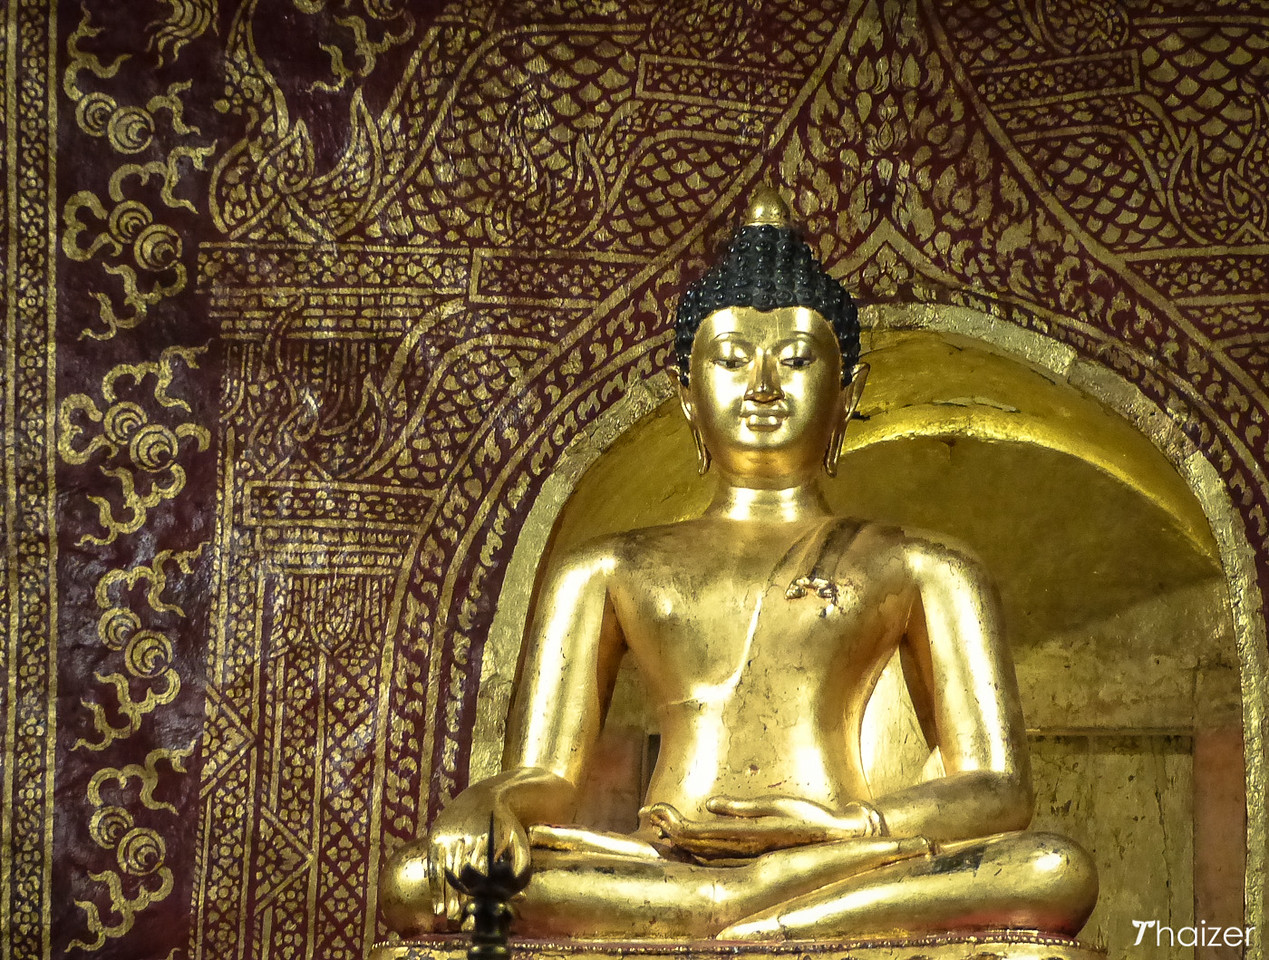 Phra Singh Buddha image, Wat Phra Singh, Chiang Mai